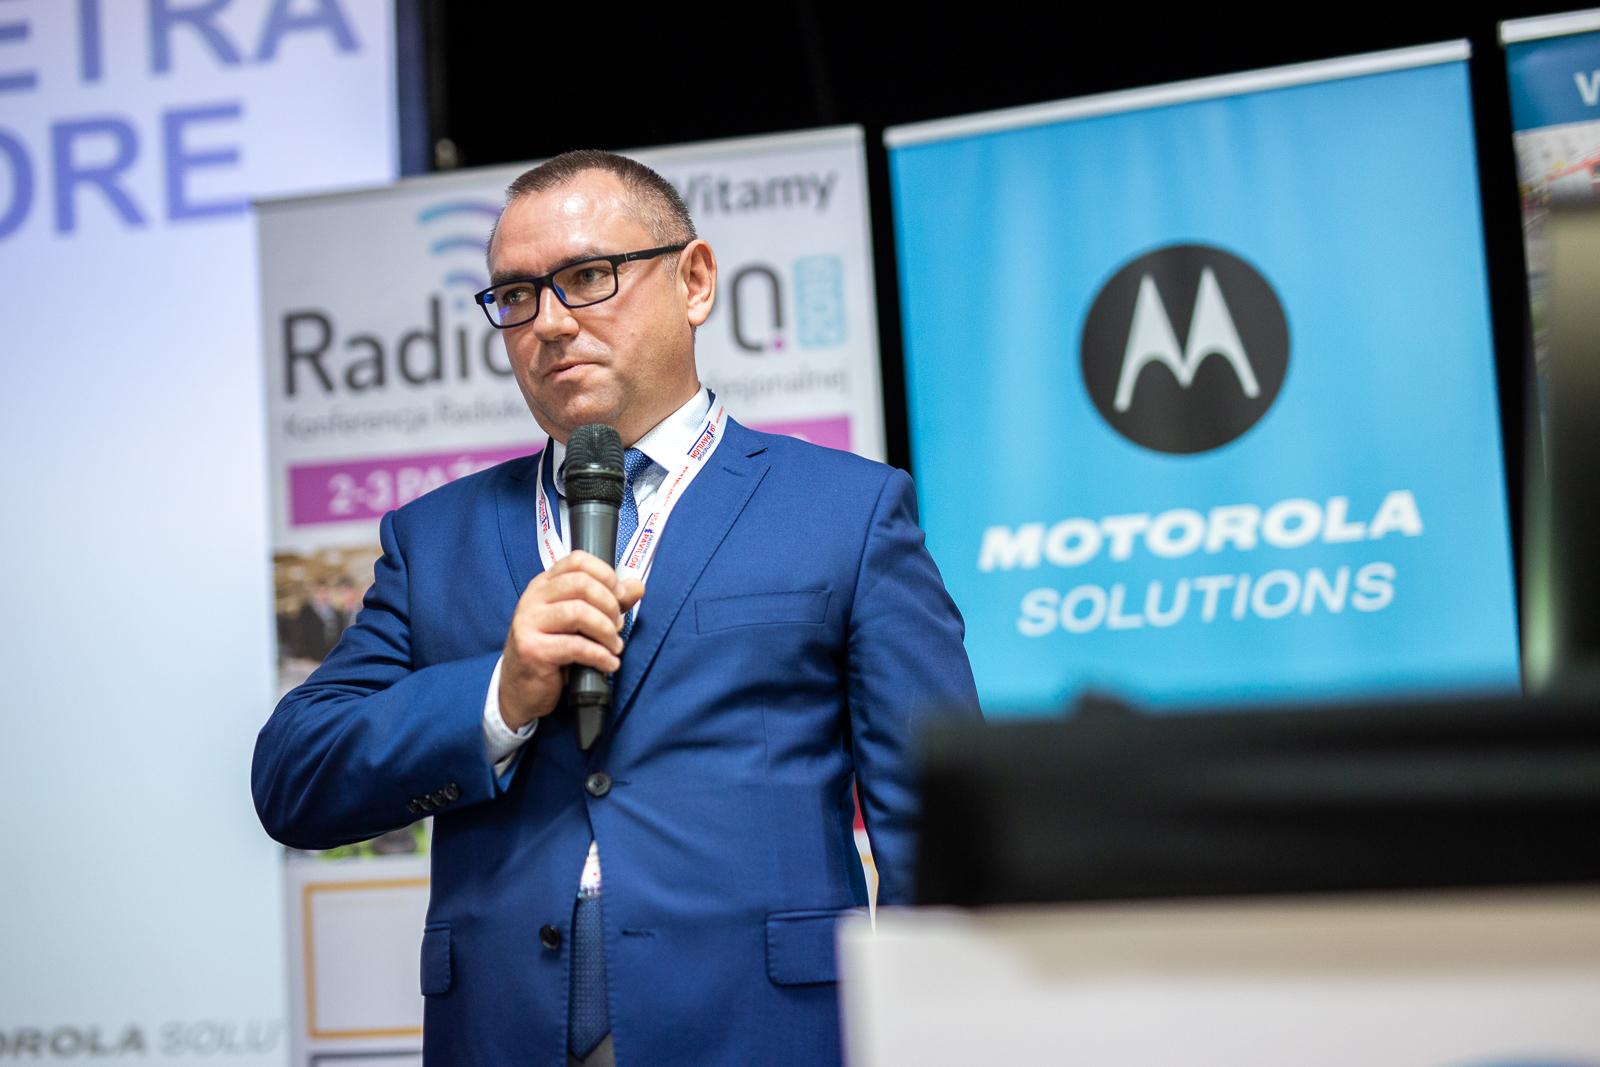 Tomasz Piktel Motorola Sotluions RadioEXPO 2019